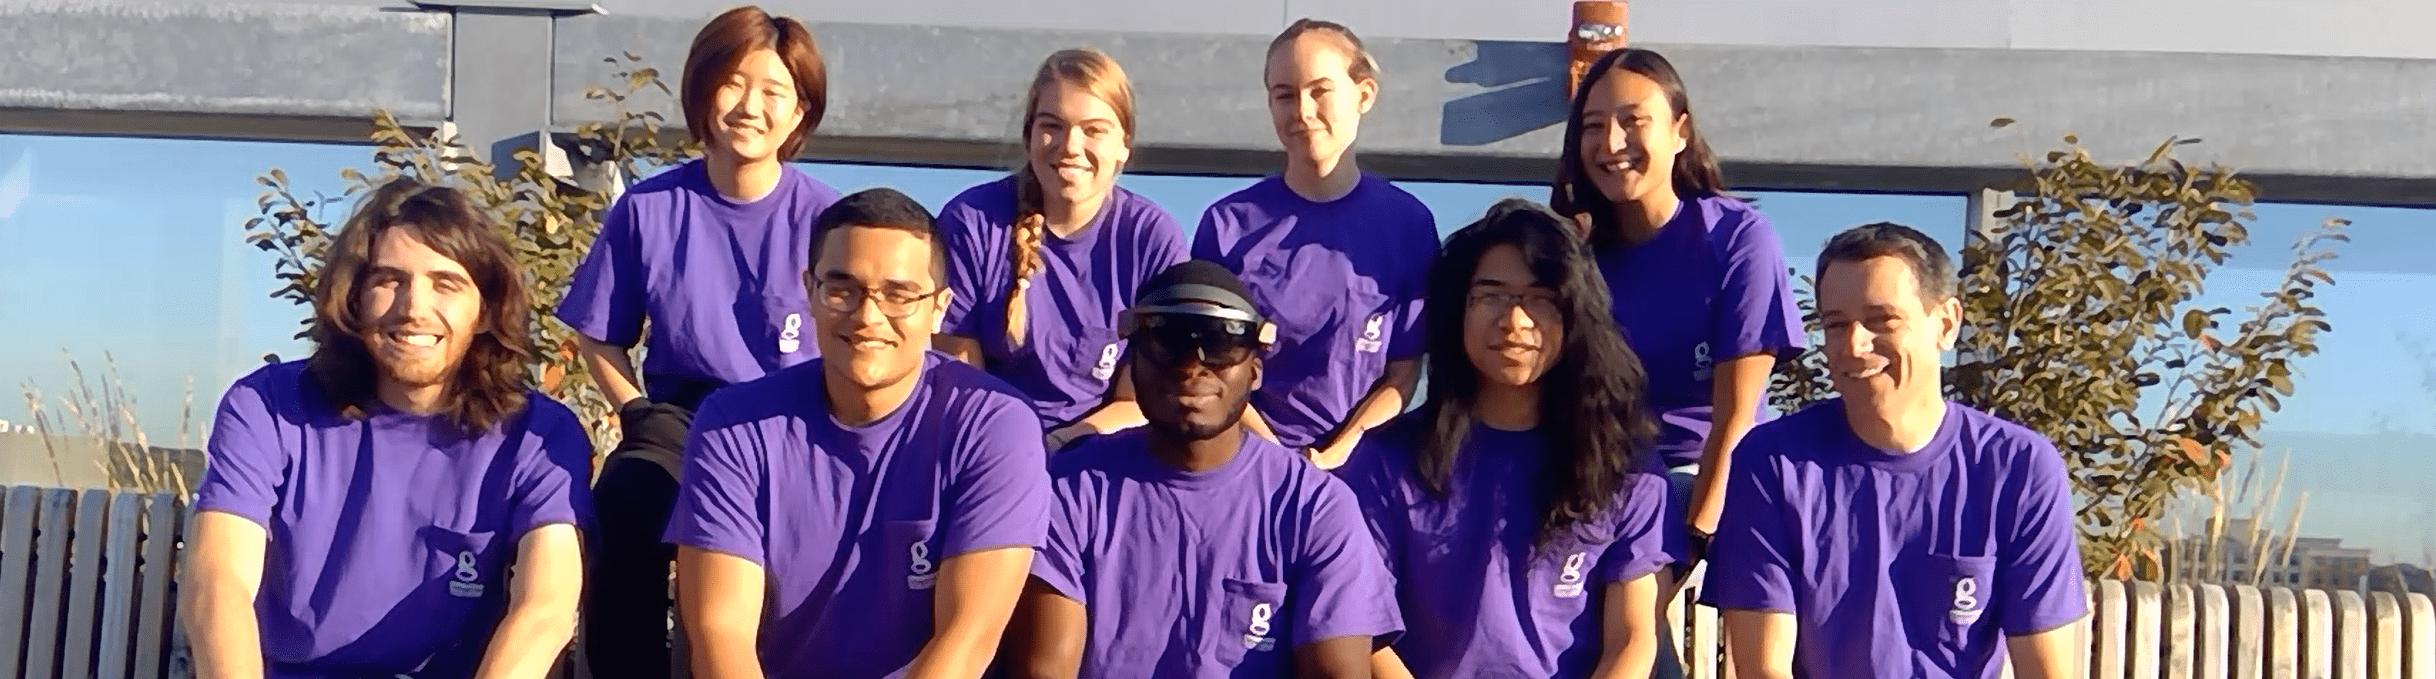 Group of Gemstone students outside, wearing matching purple tshirts